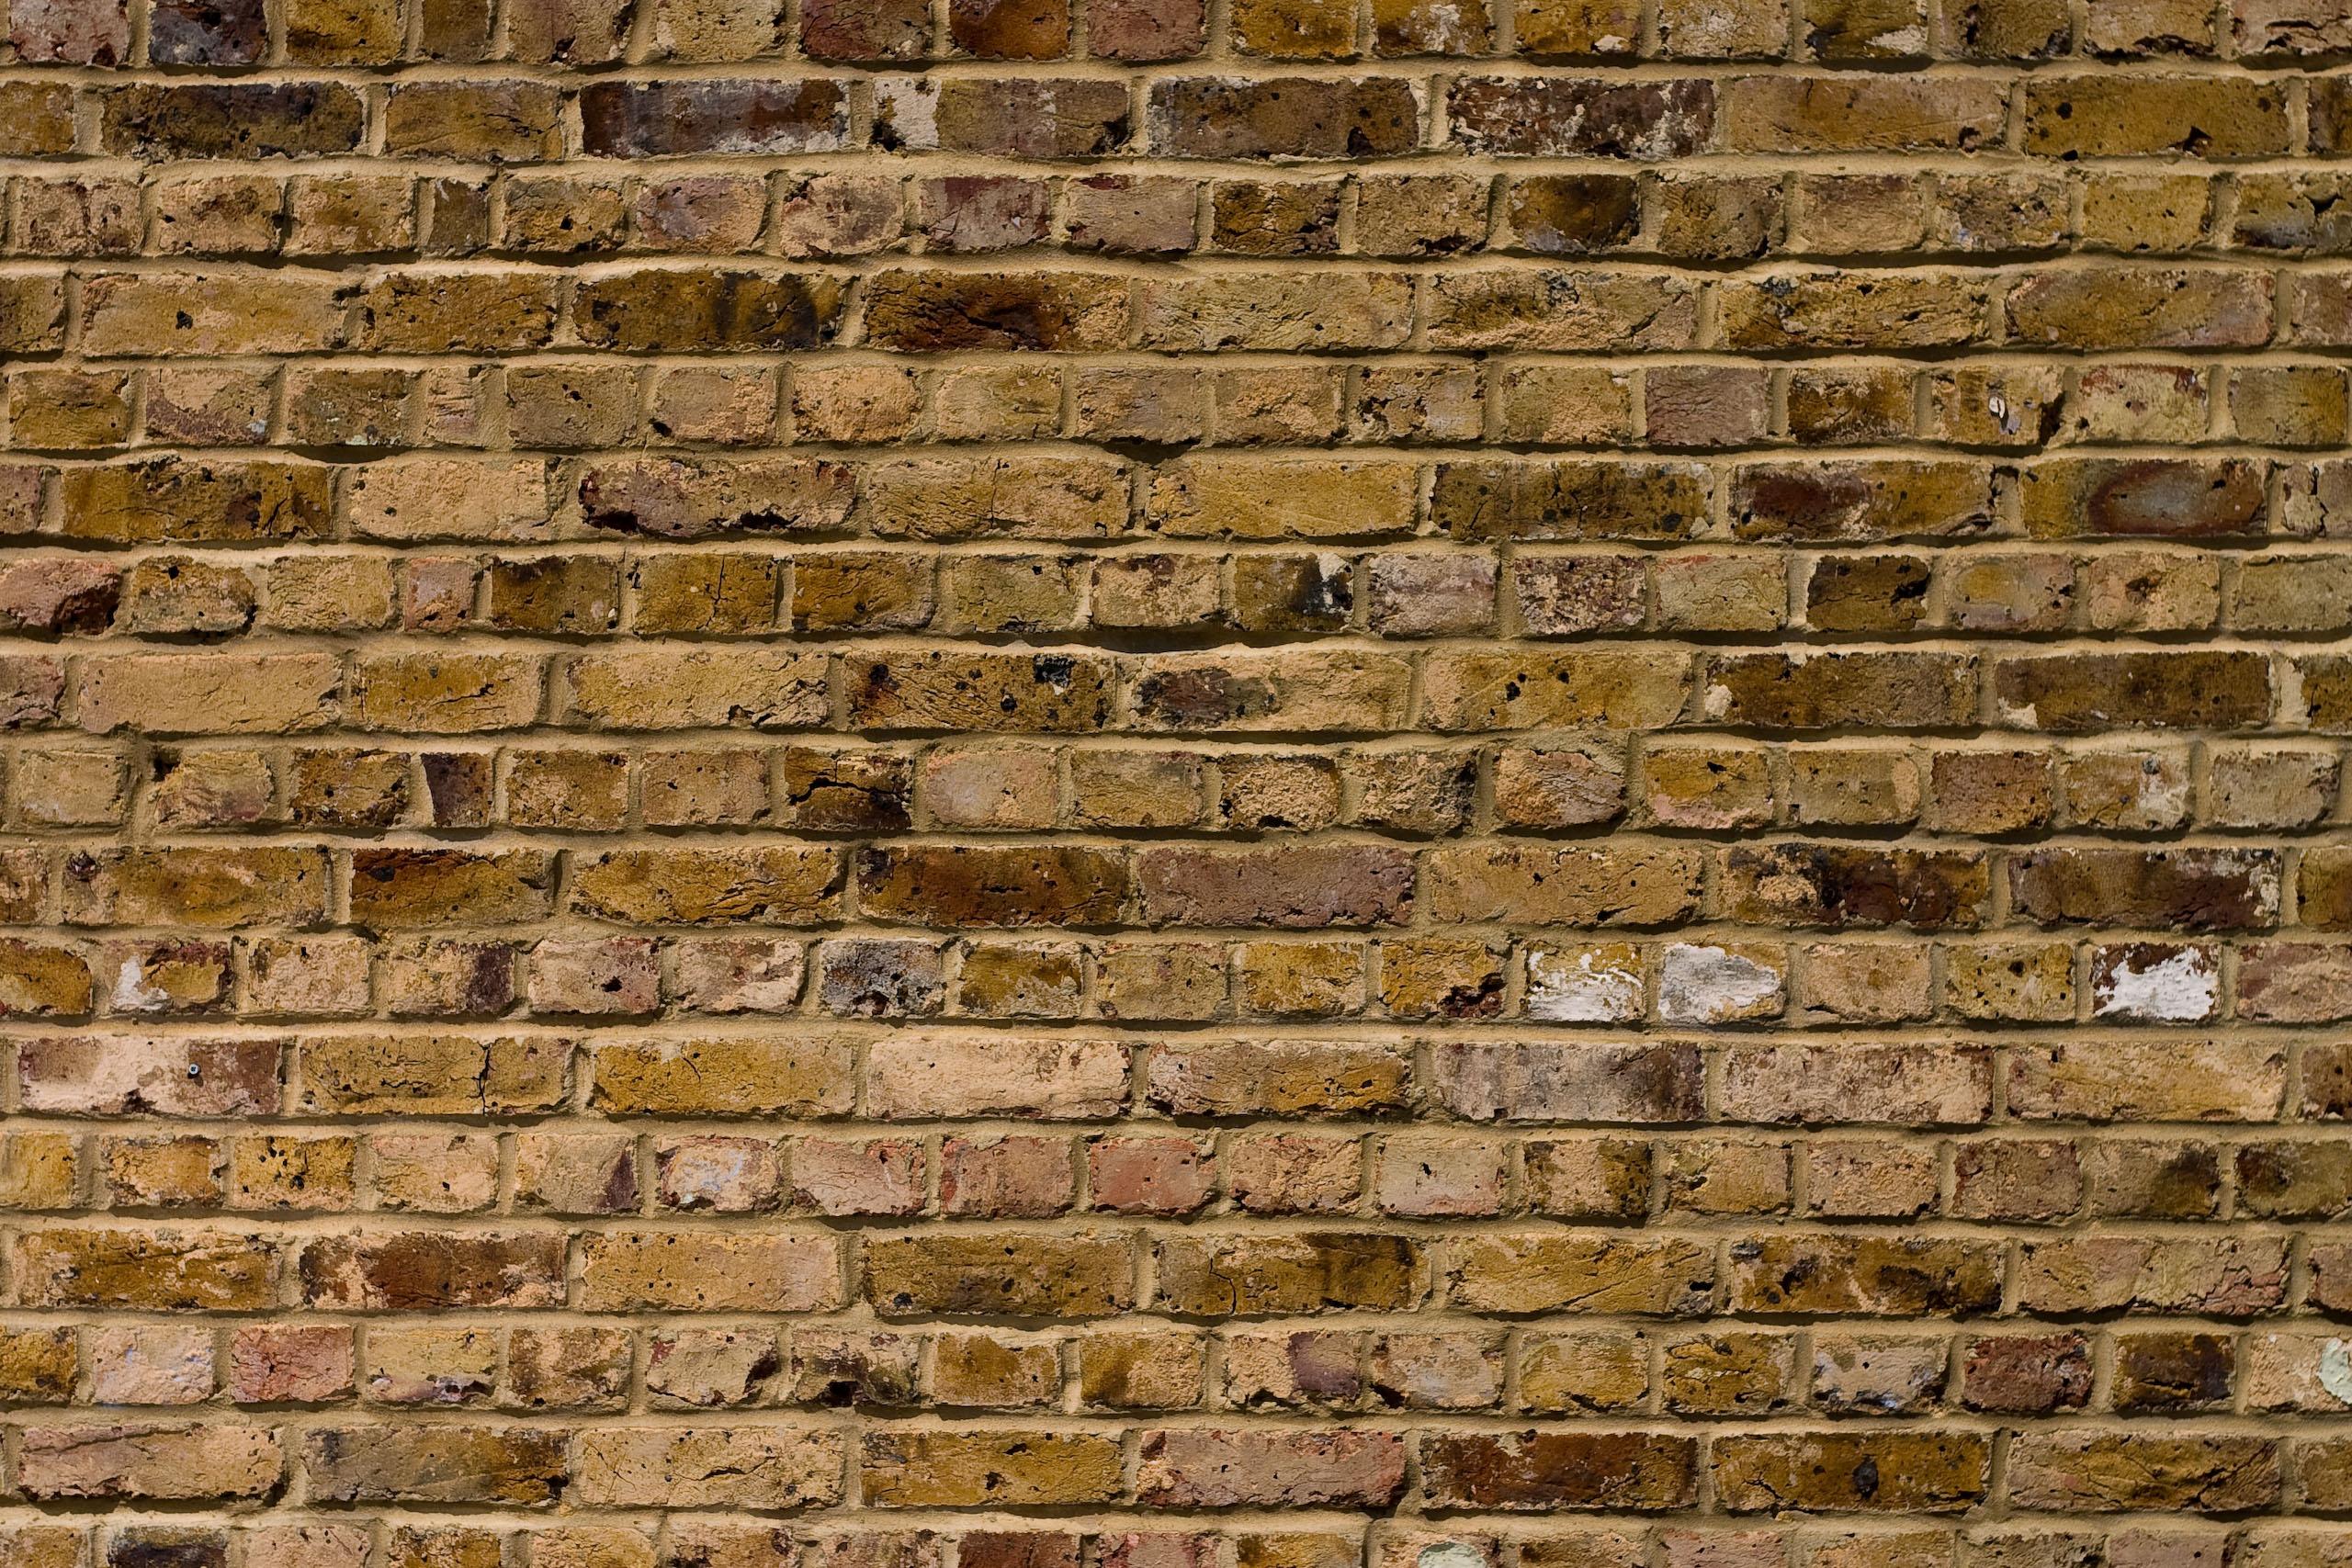 7 Brick Wall Texture Photoshop Images - Brick Texture